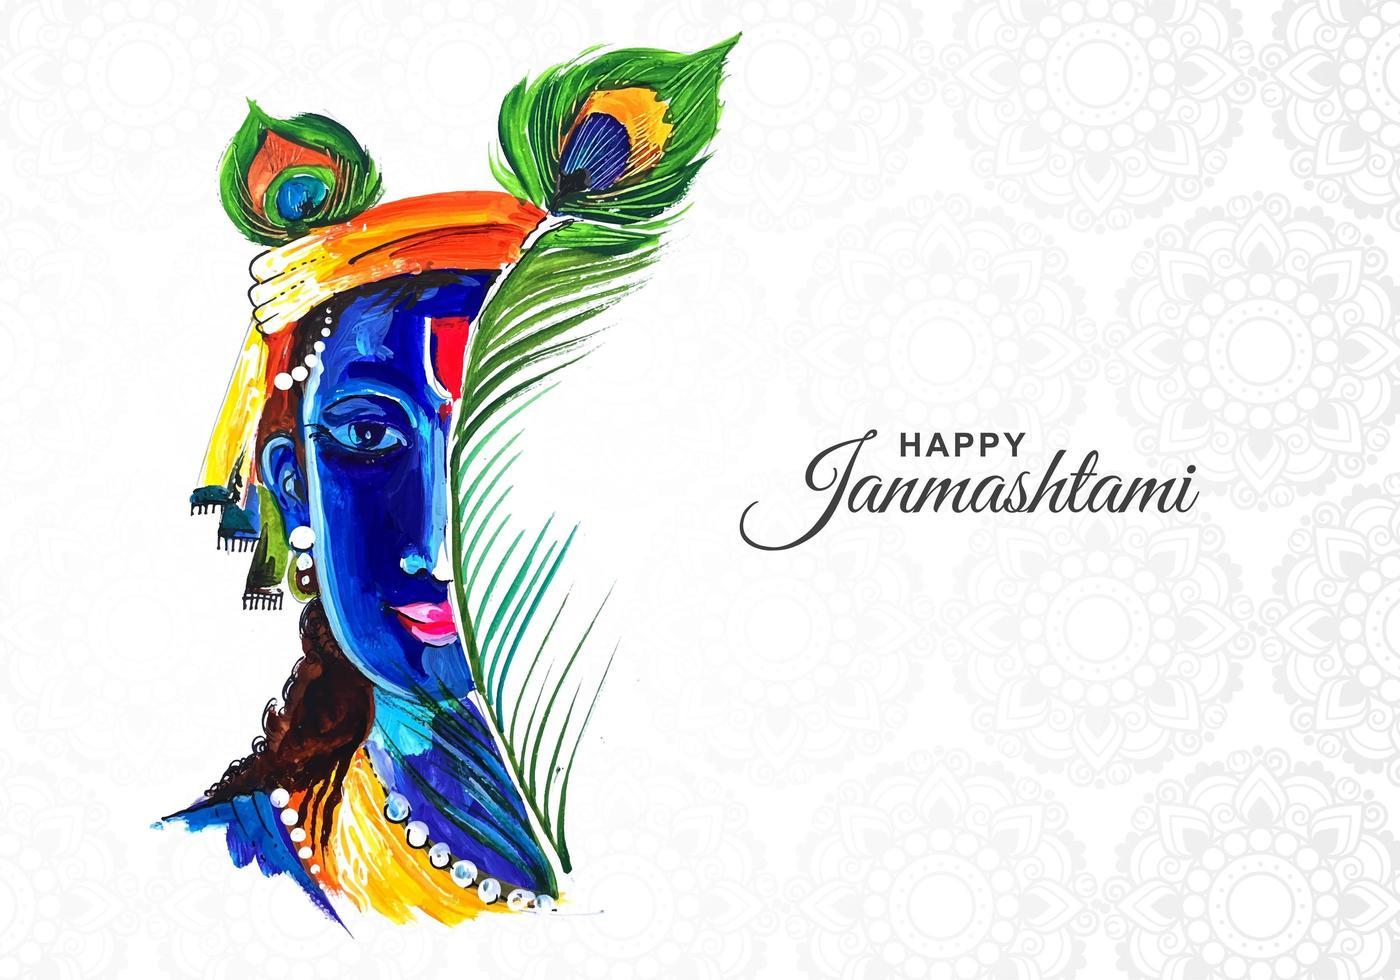 kleurrijke krishna half gezicht janmashtami kaart achtergrond vector